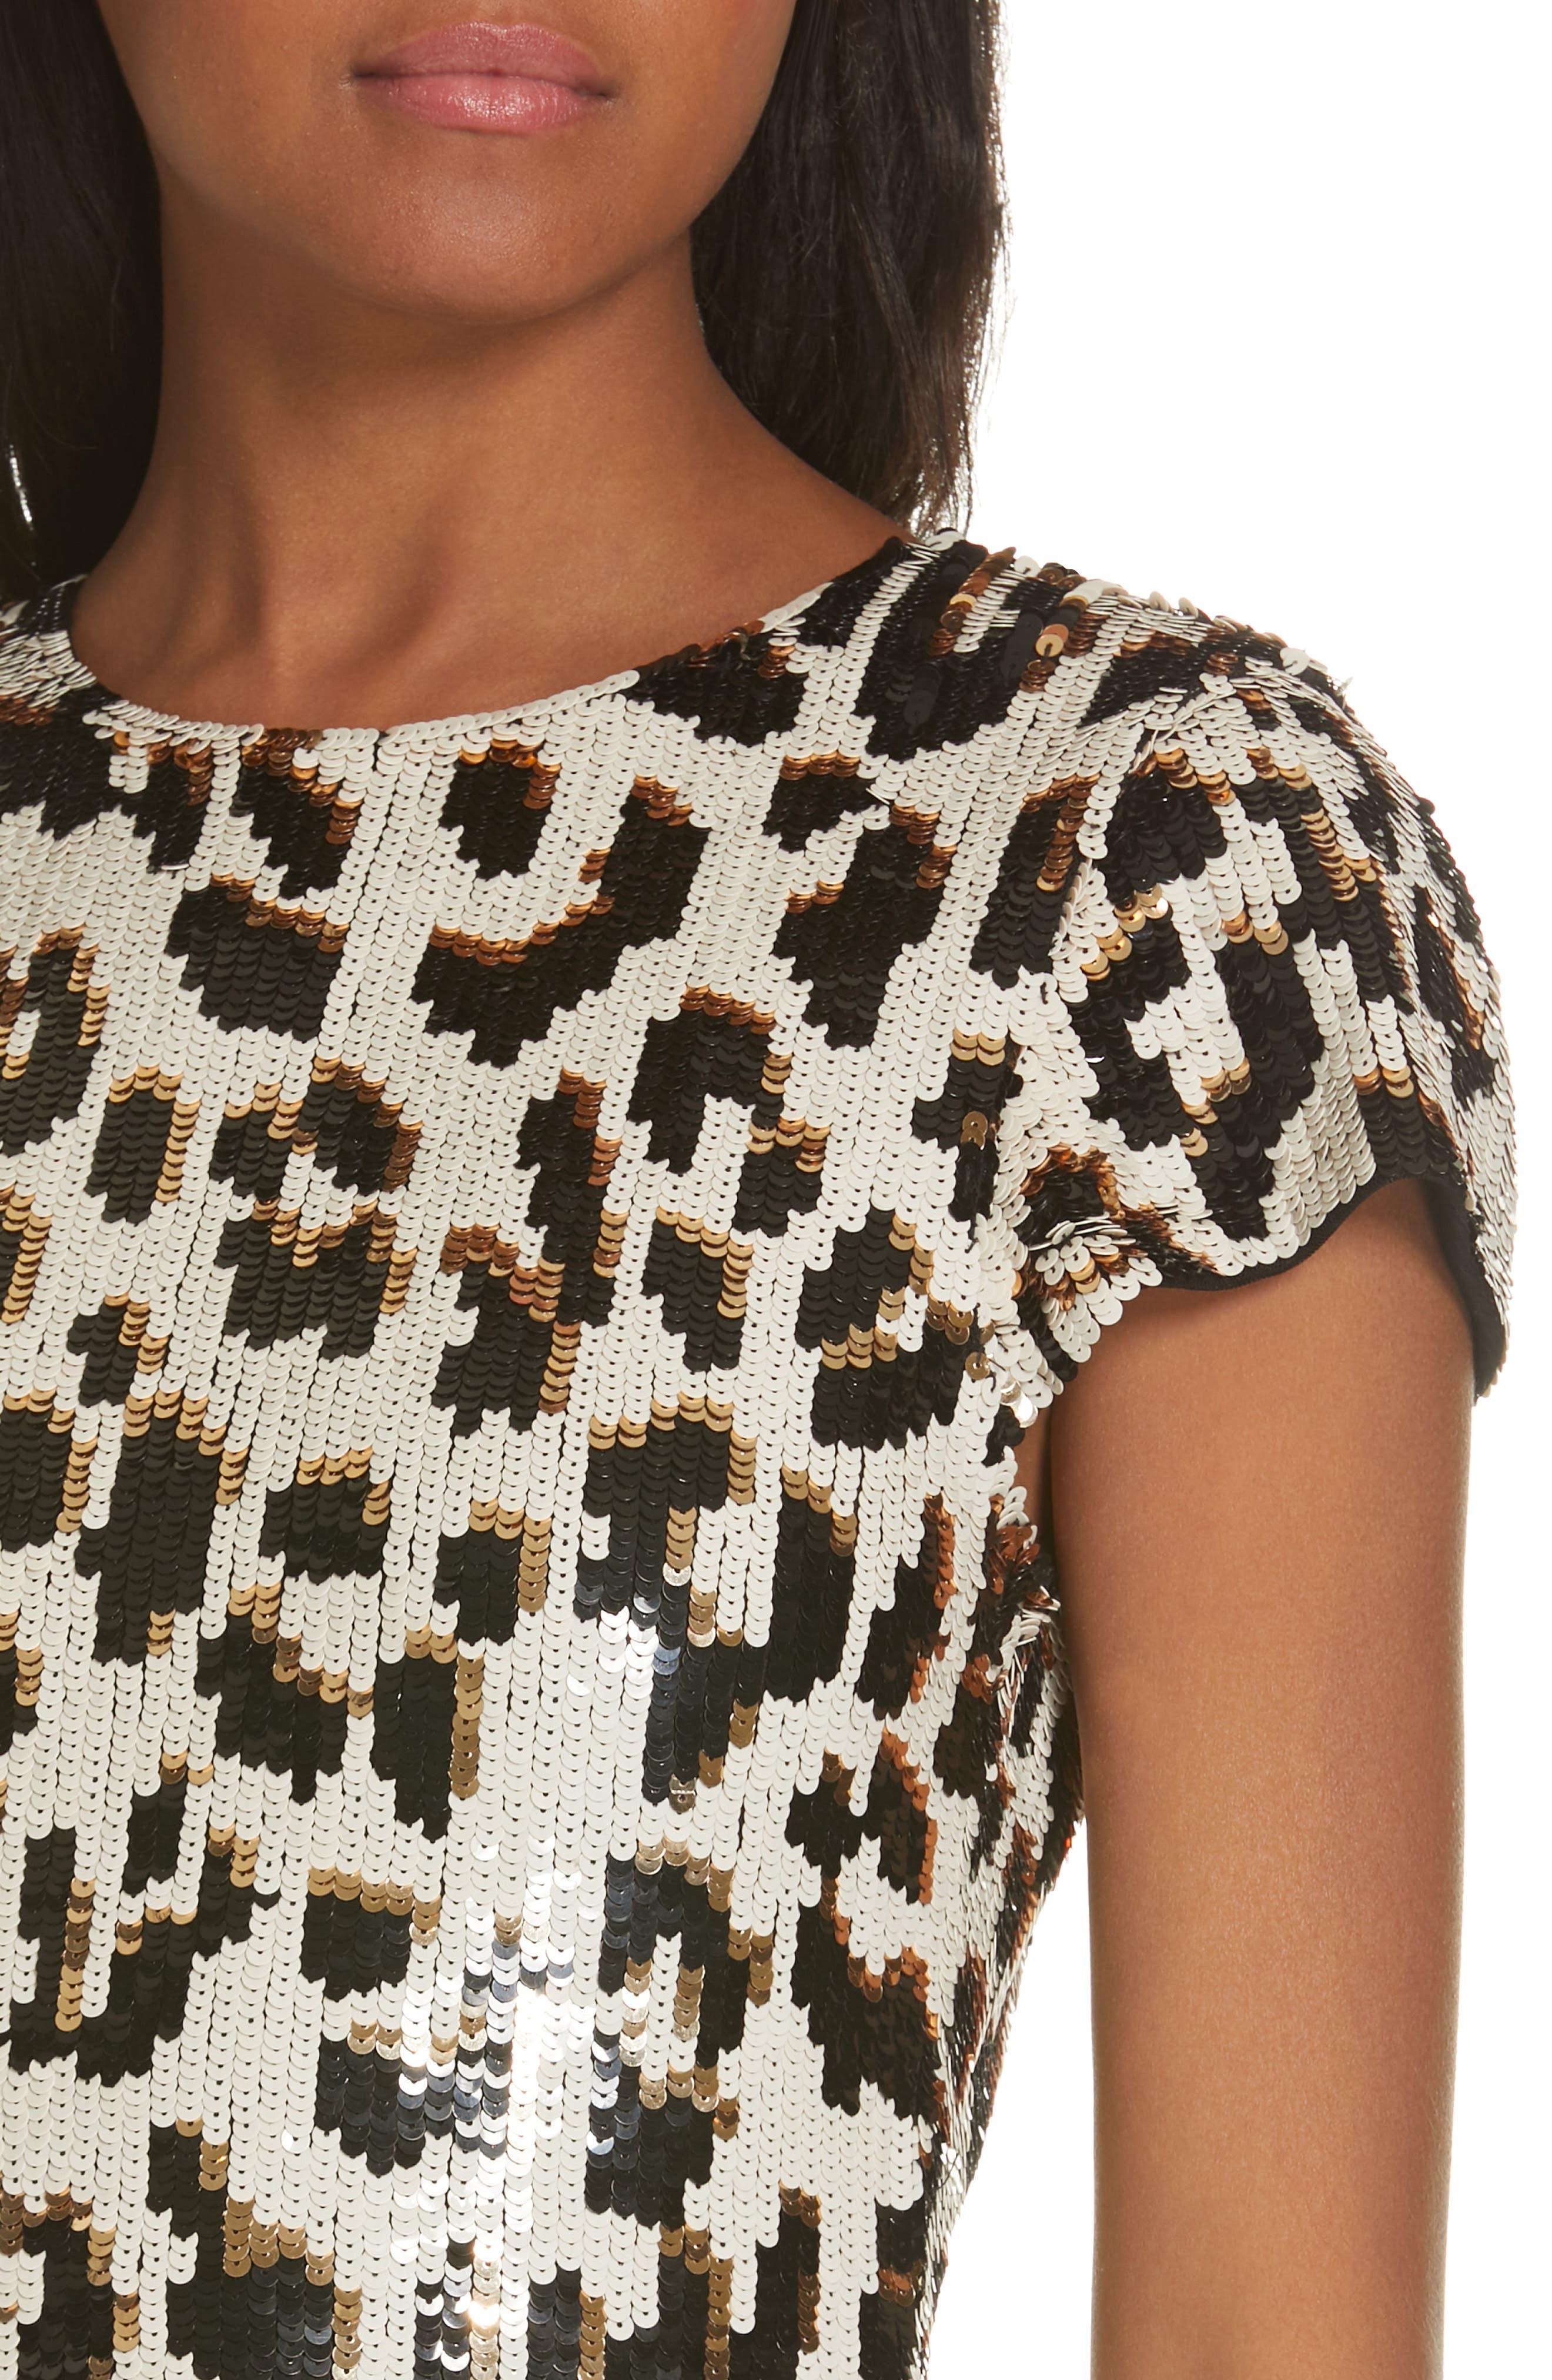 ALICE + OLIVIA,                             Nat Sequin Sheath Dress,                             Alternate thumbnail 4, color,                             LEOPARD